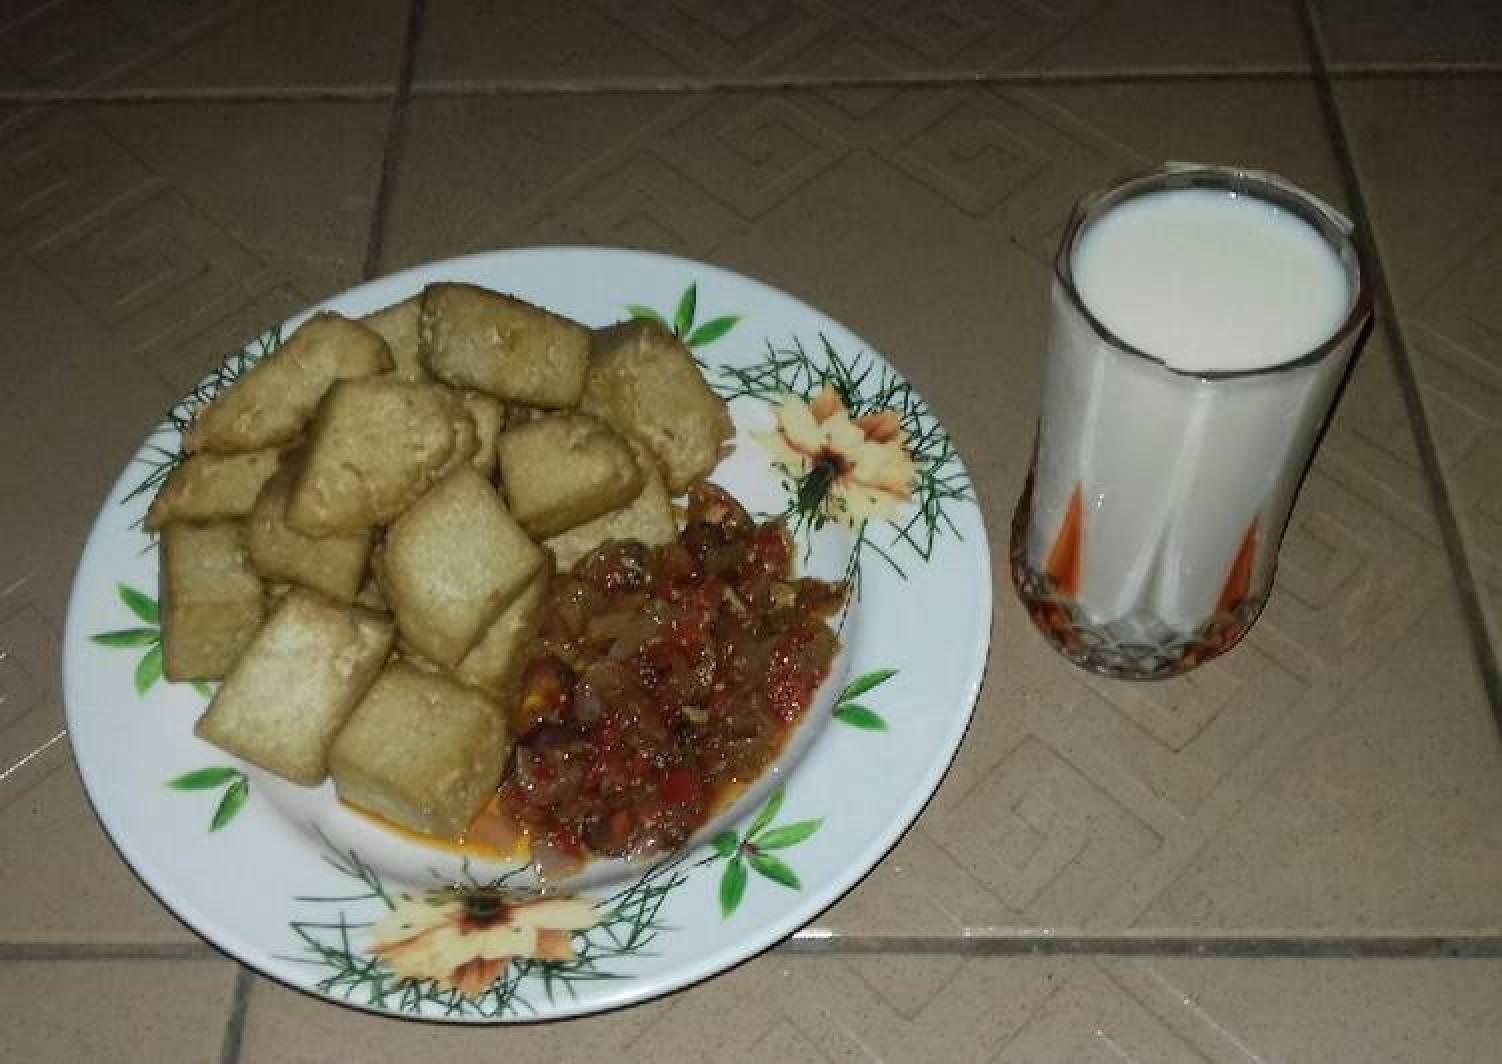 Awara and soya milk